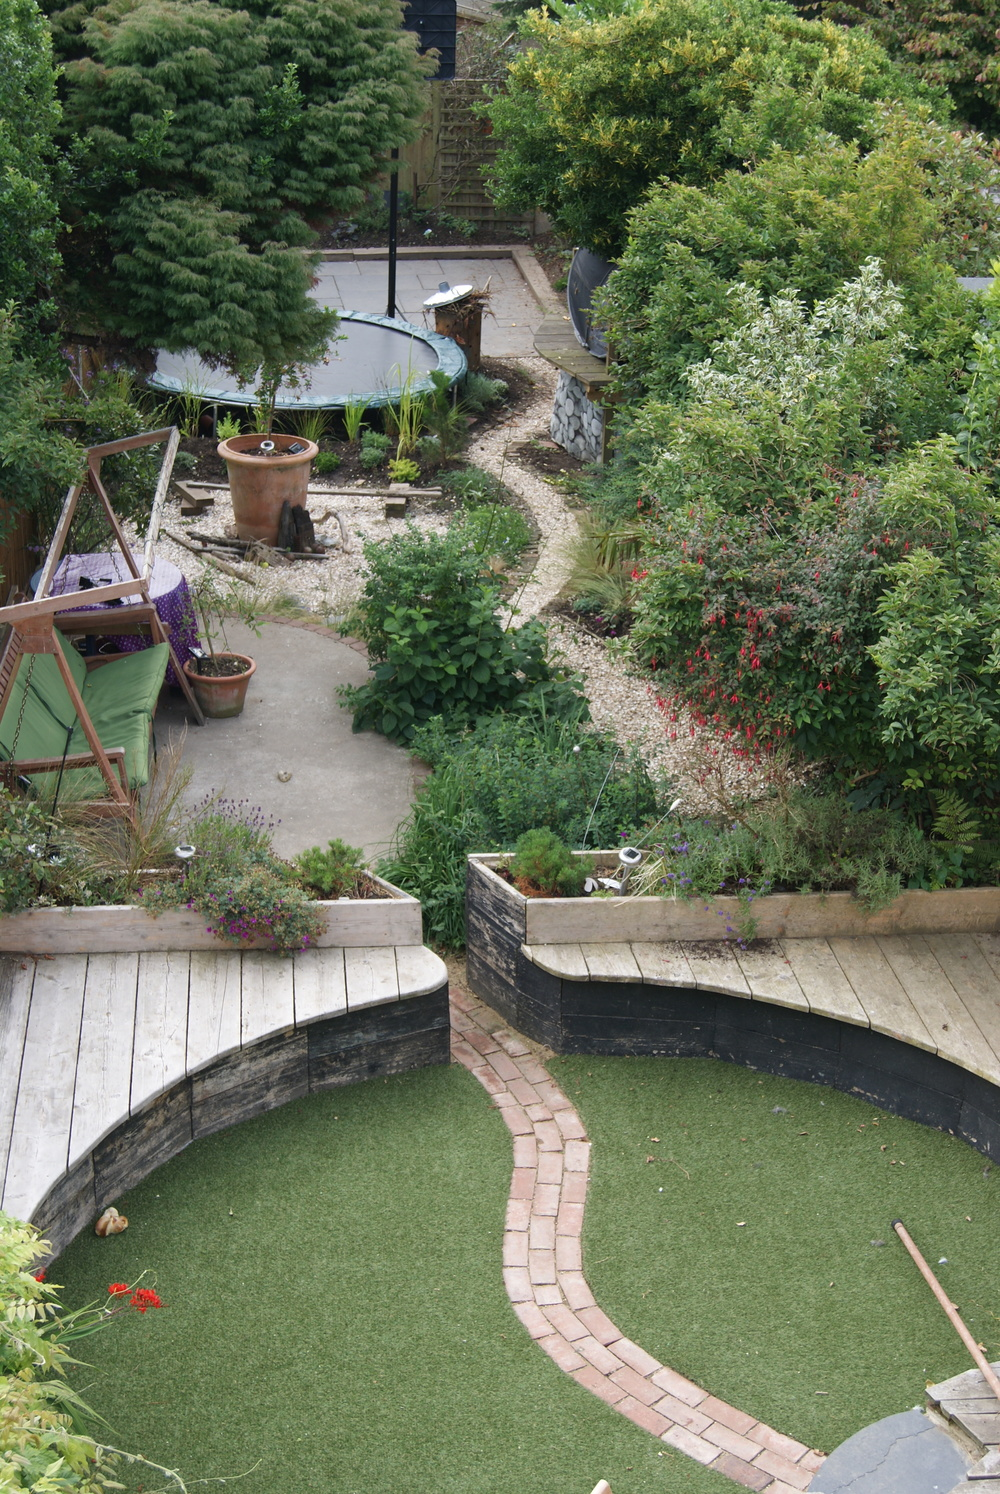 Ashb road garden design.JPG